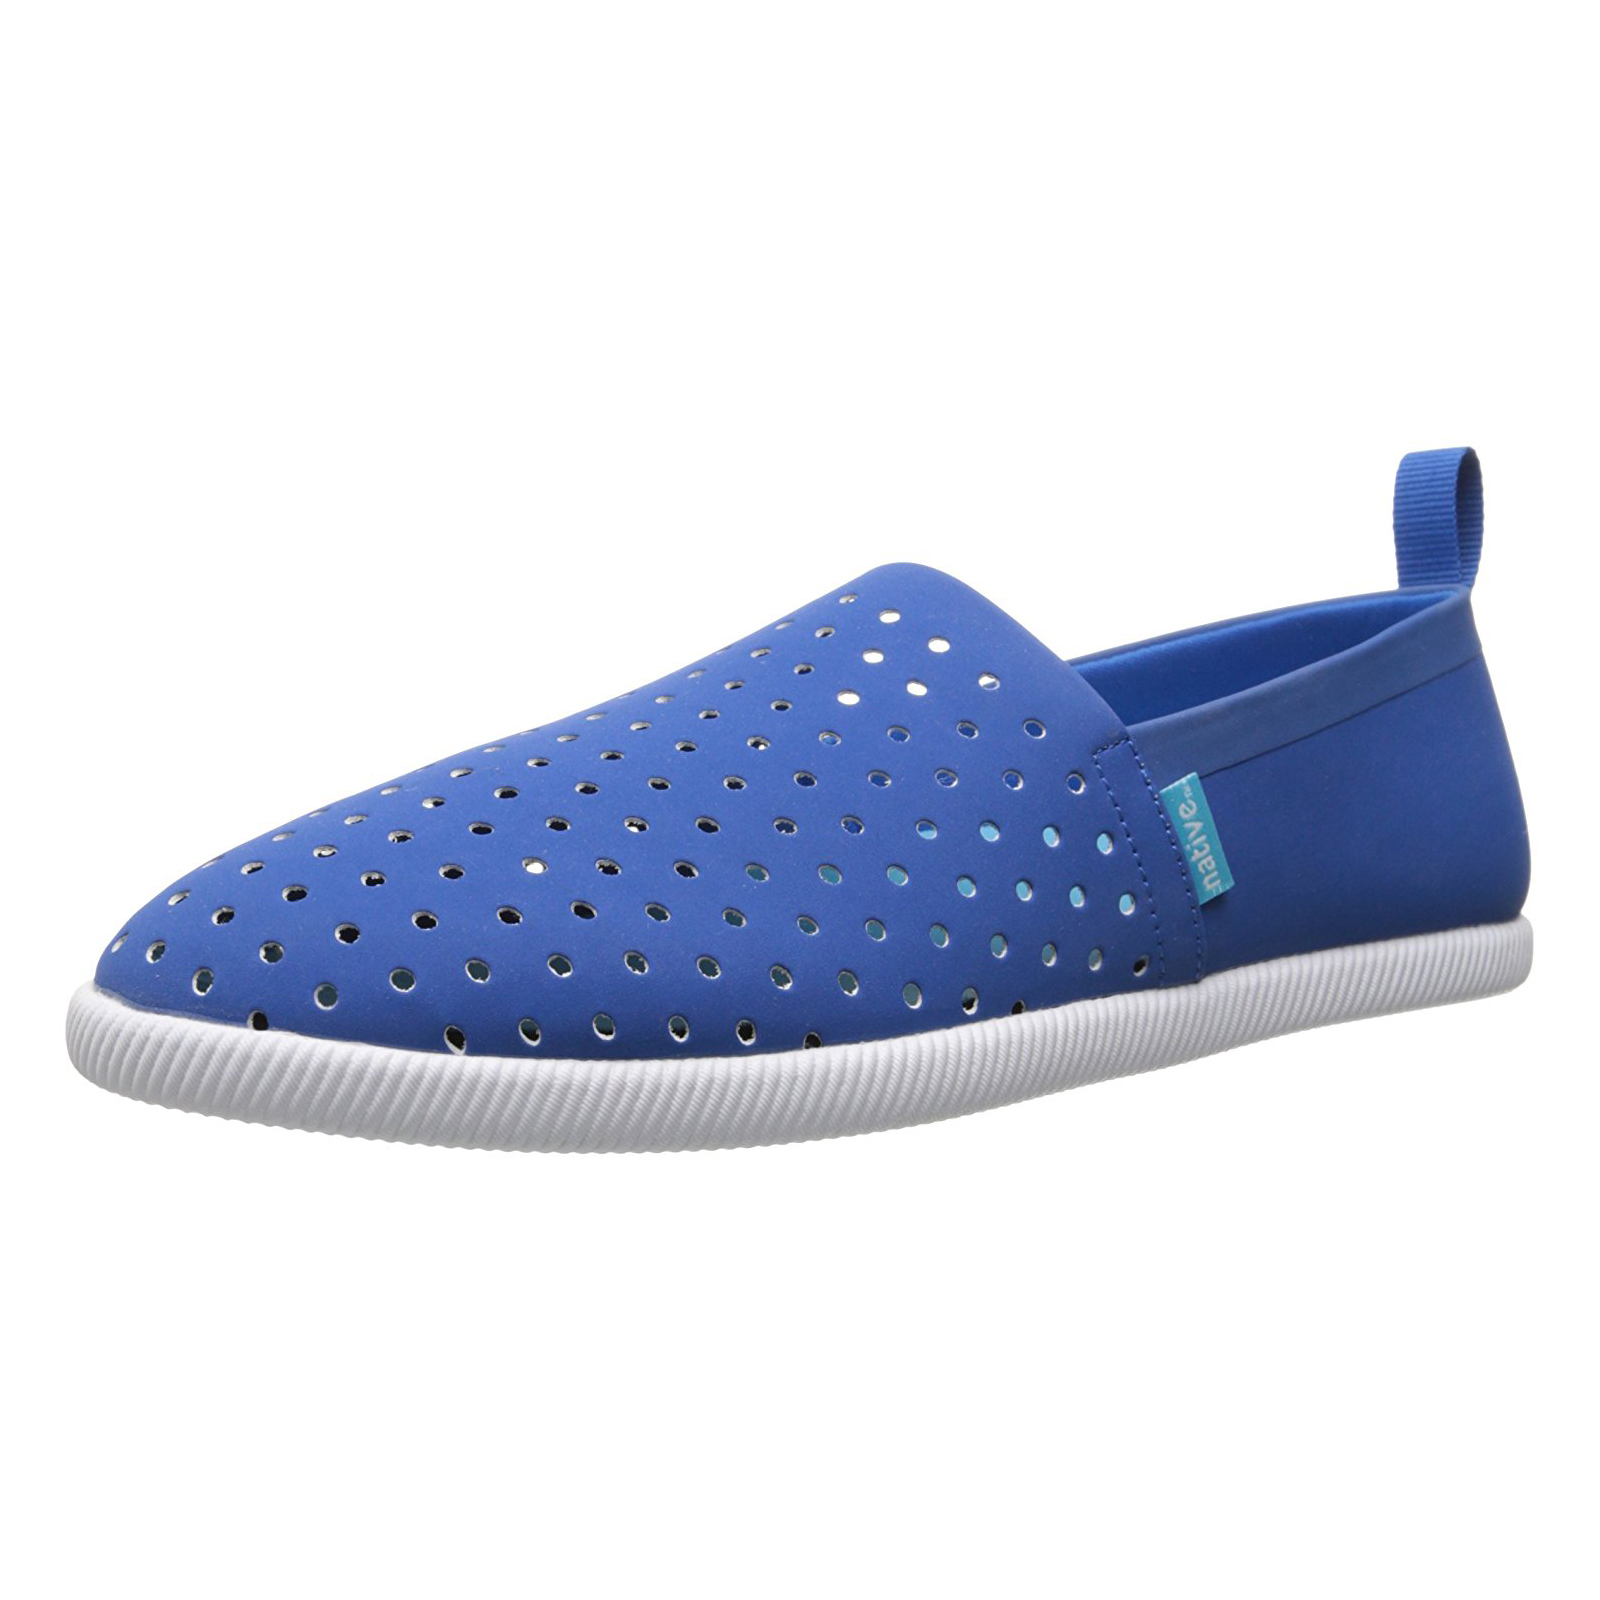 Native Sneakers Venice 1 Victoria bluee Shell White bluee